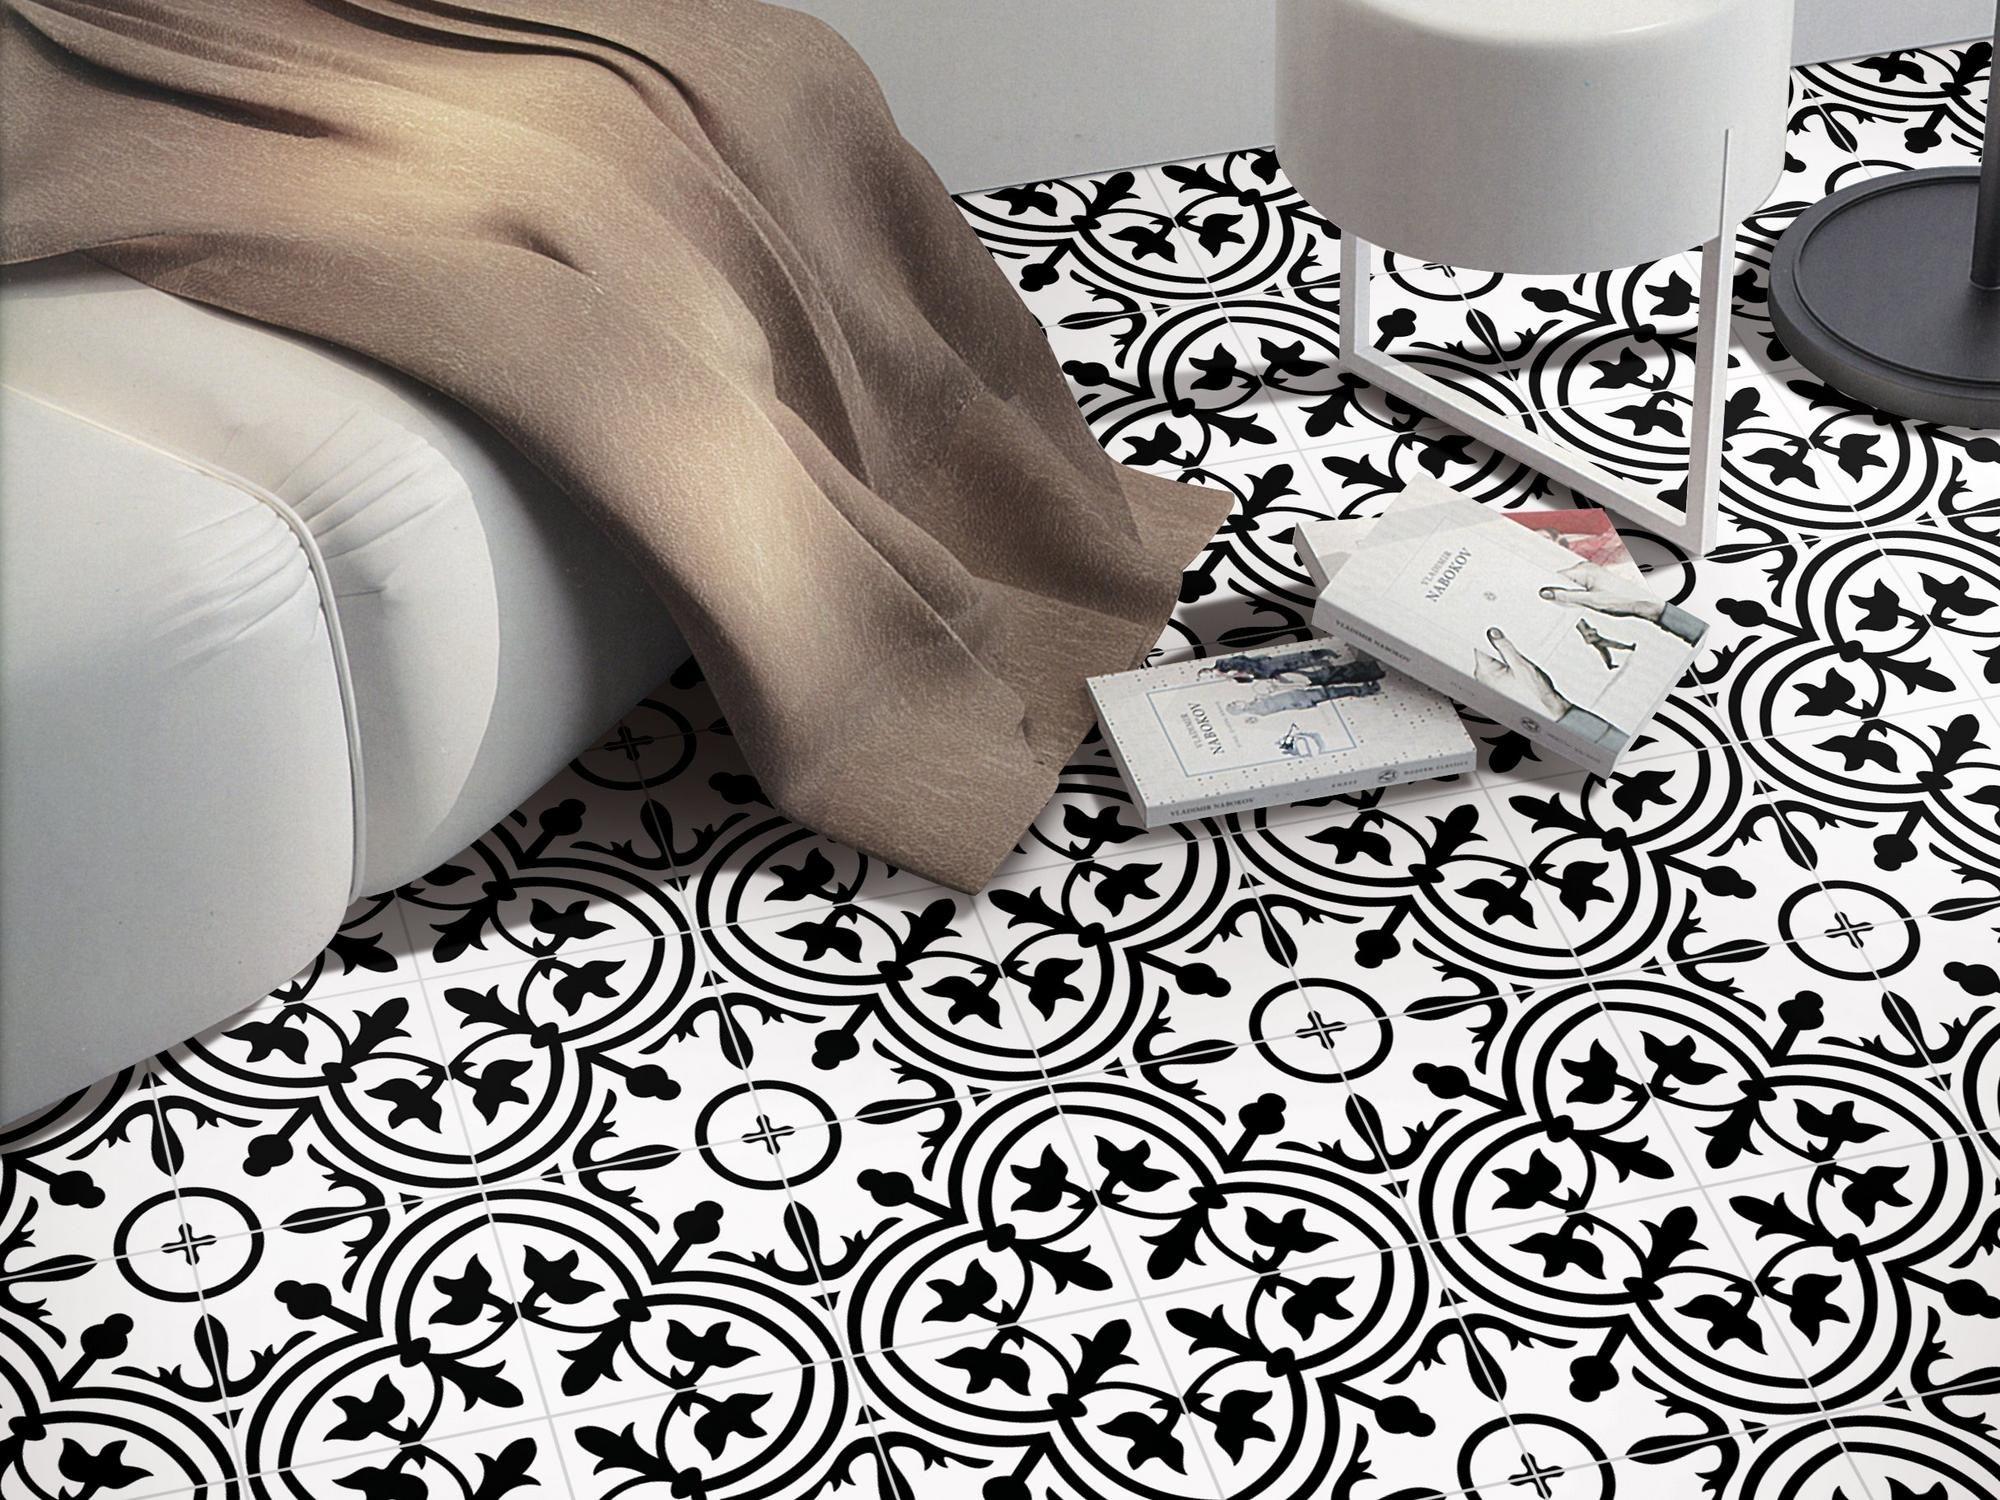 Bayona Decorative Ceramic Tile Ceramic Floor Tiles Ceramic Tiles Ceramic Floor Tile